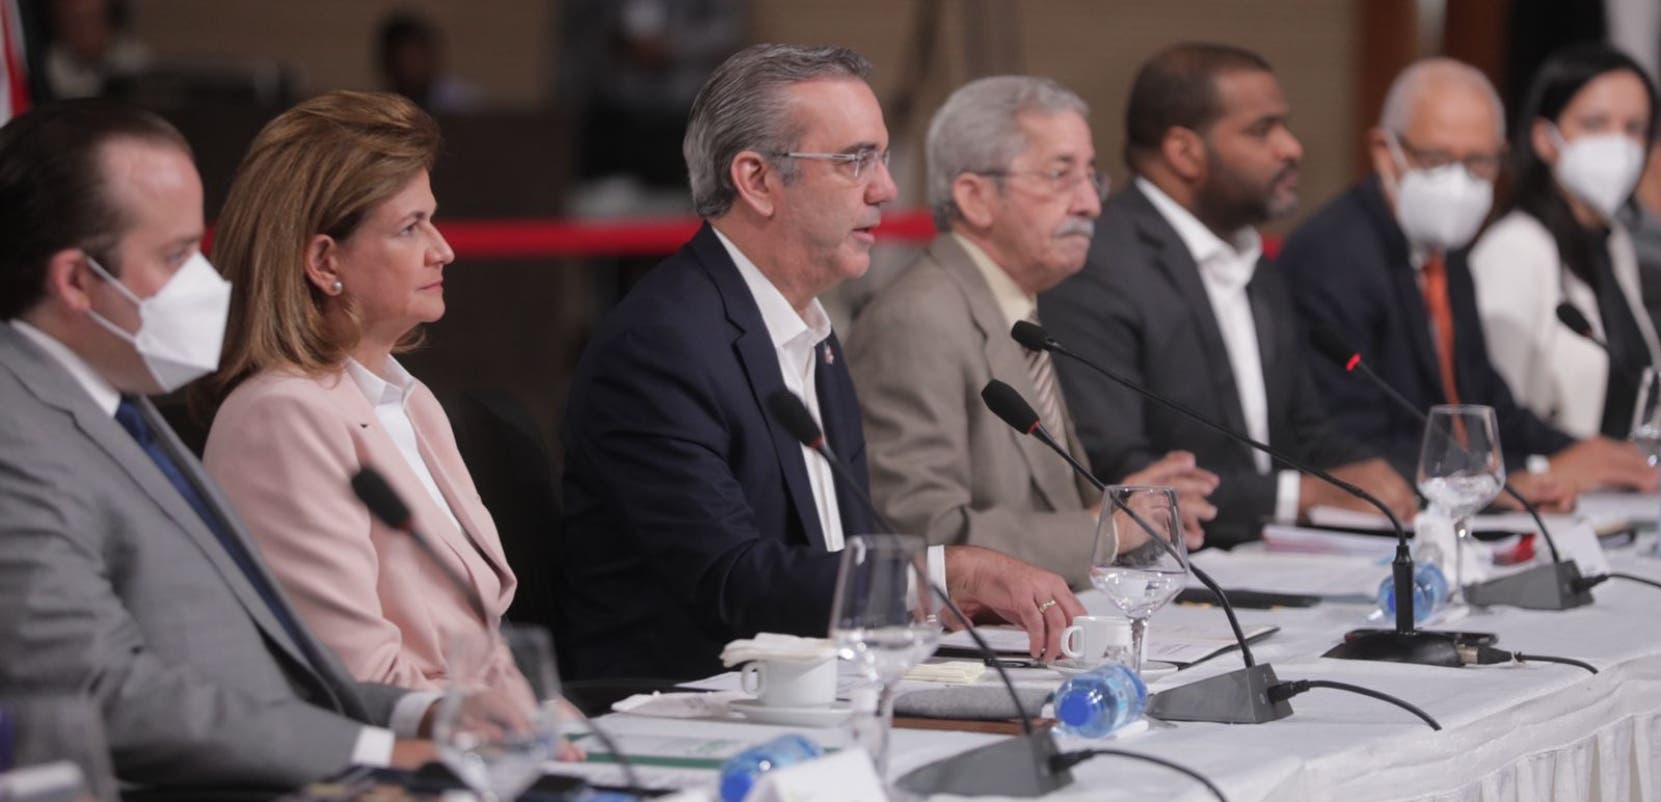 Rechazo de partidos a reforma fiscal dificulta  el consenso para aprobarla